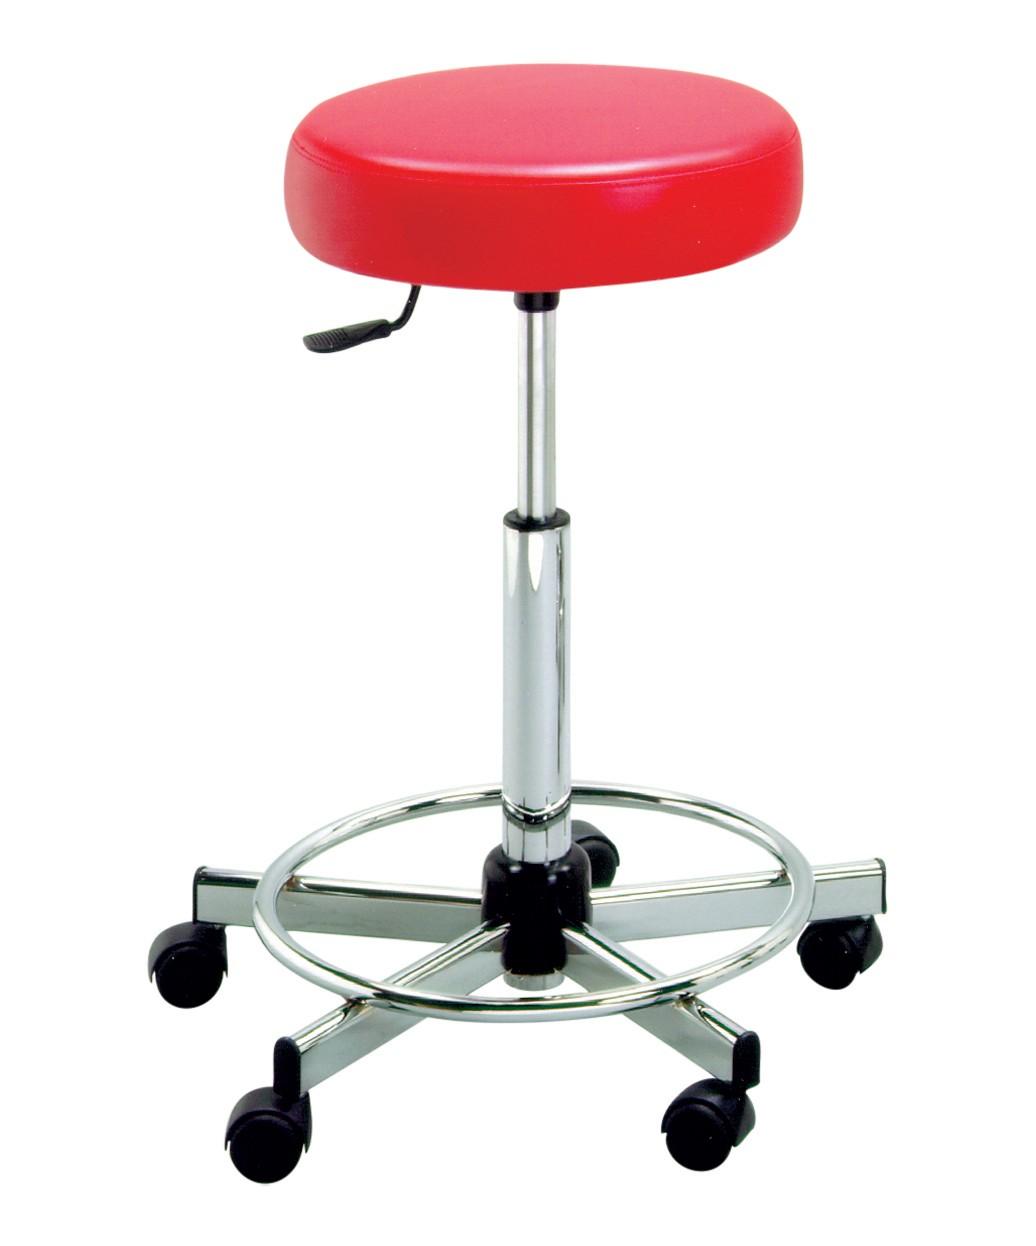 Pibbs 726 Round Seat Stool